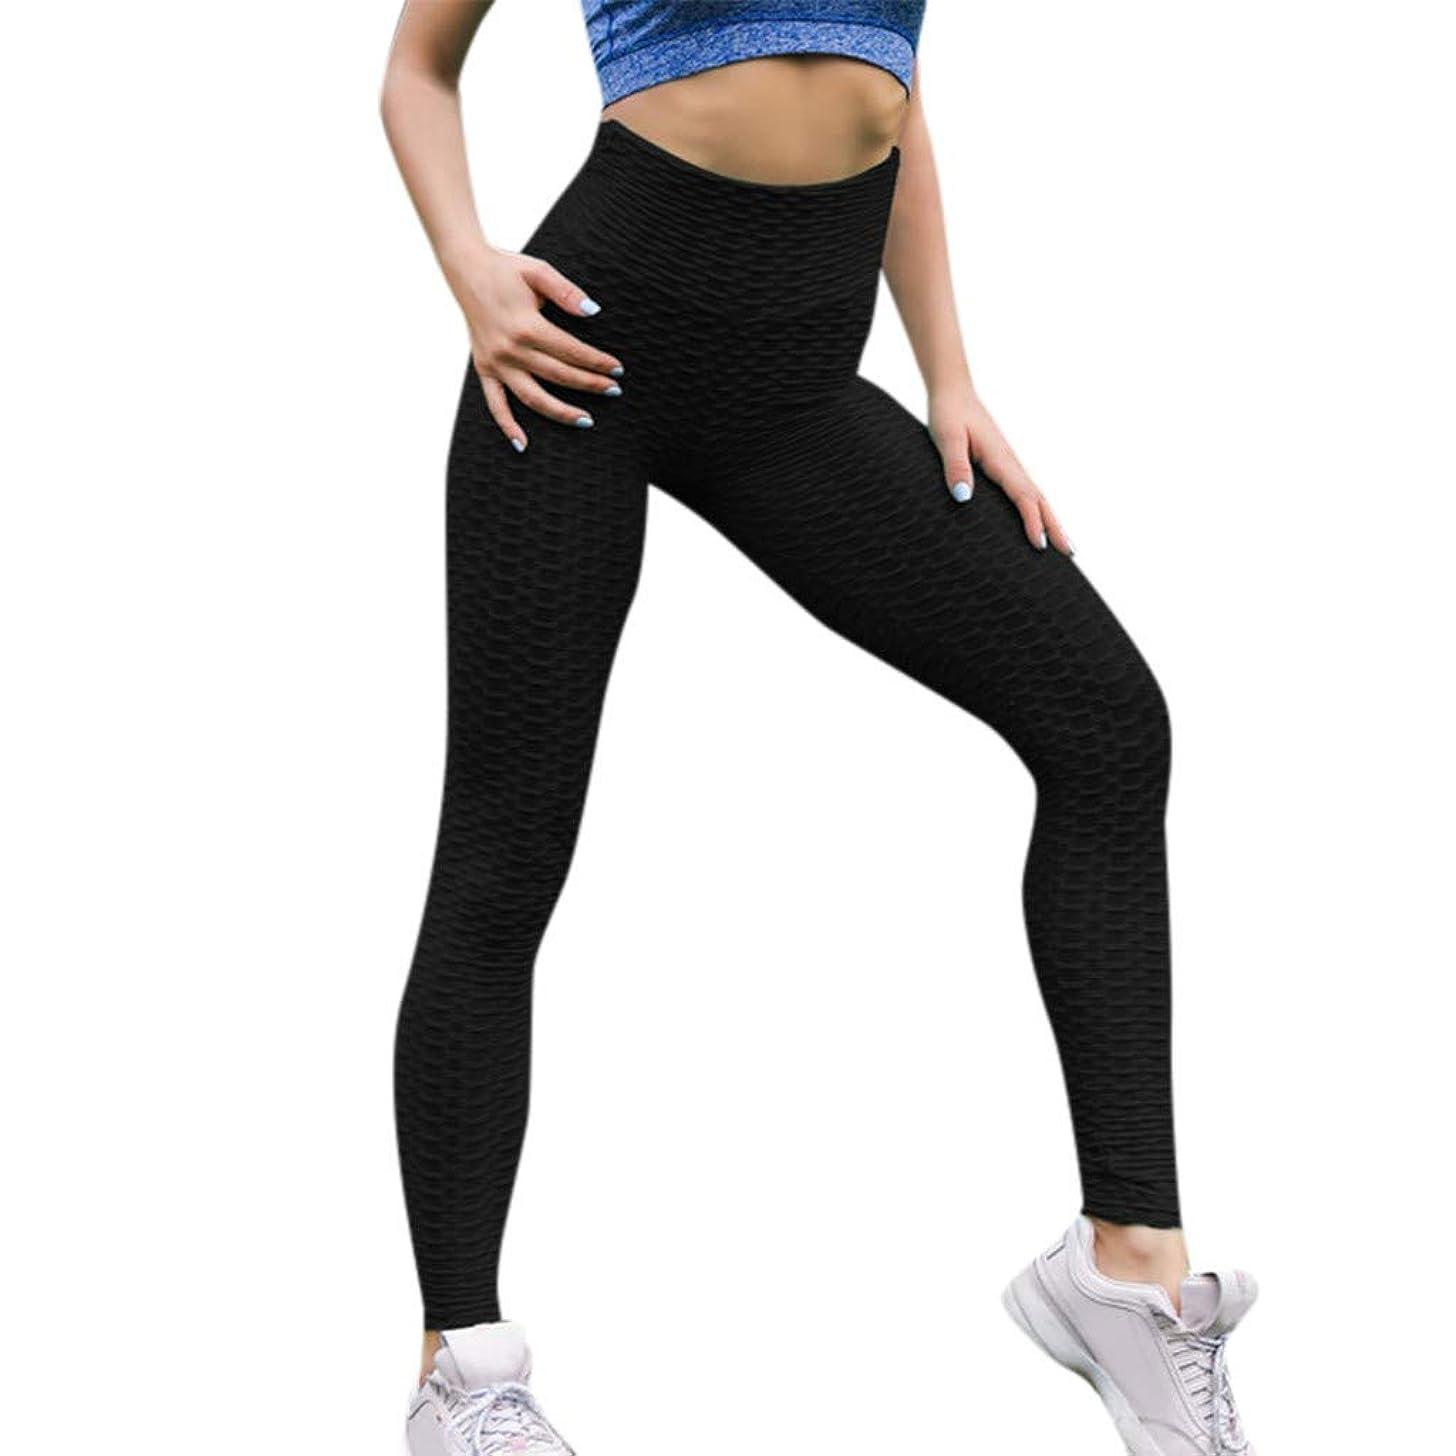 Women High Waist Yoga Pants Fold Cross Strap Trouser,Flexible Compression for Yoga,Fitness & Everyday Wear